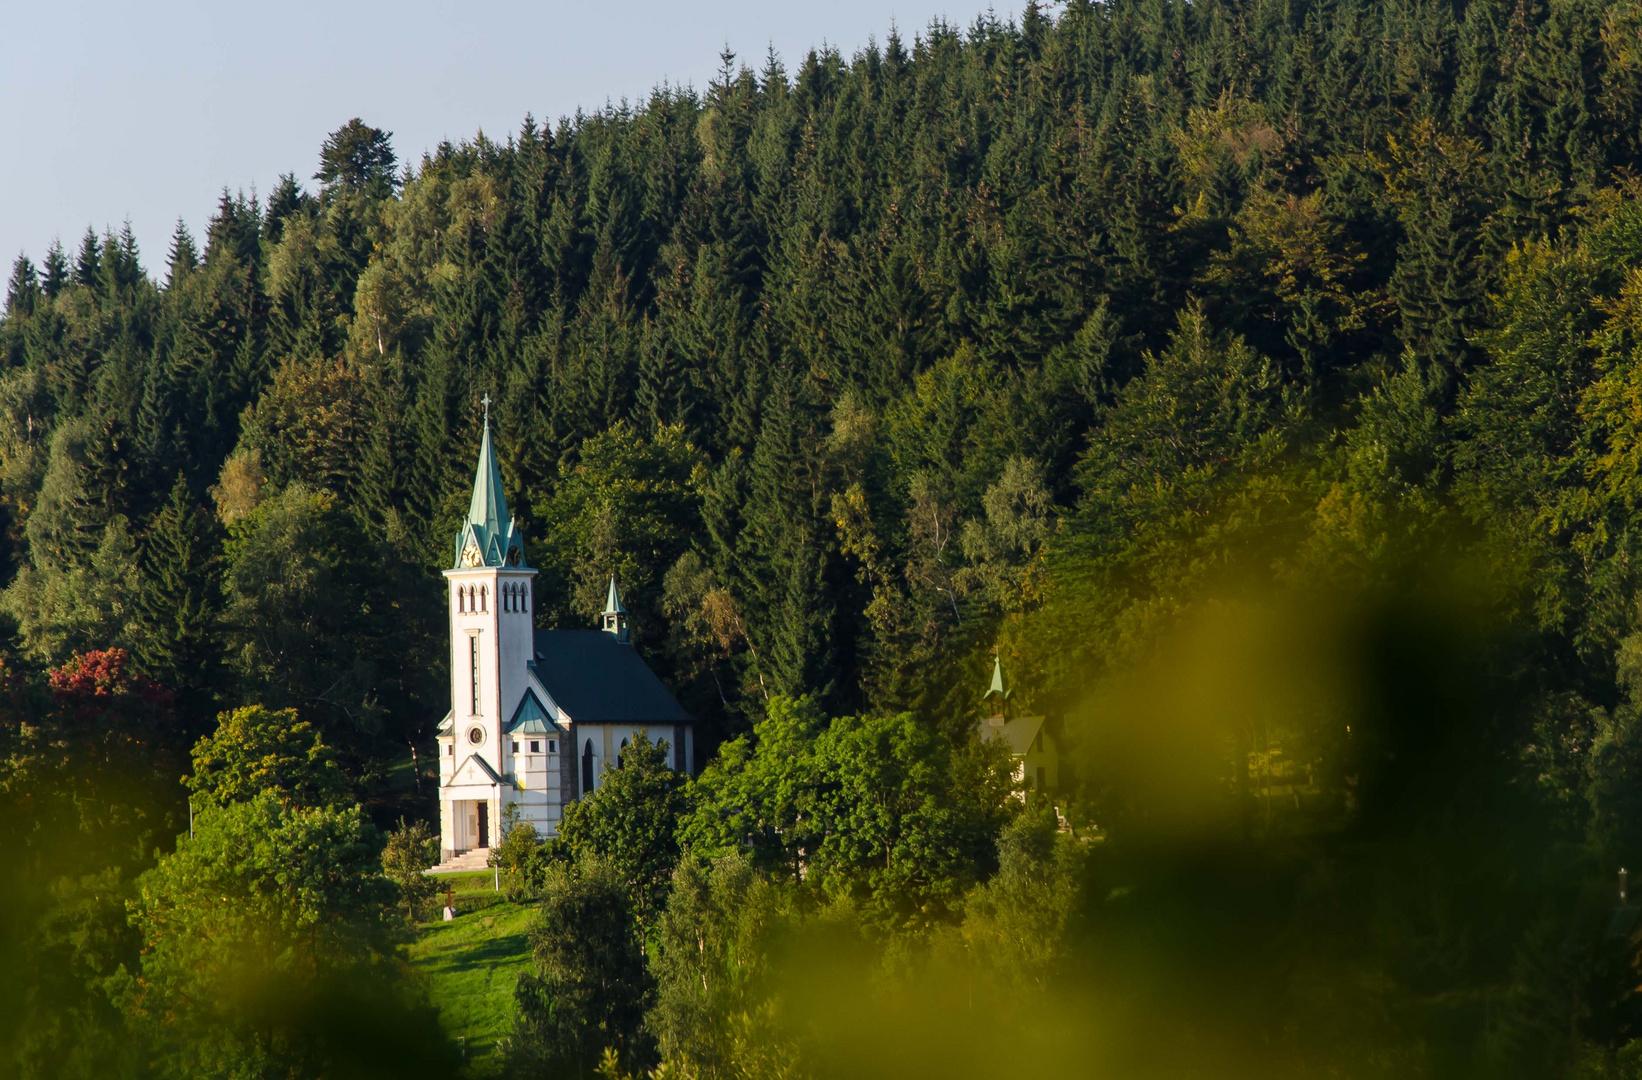 Kirche in Friedrichswald (Bedrichov)